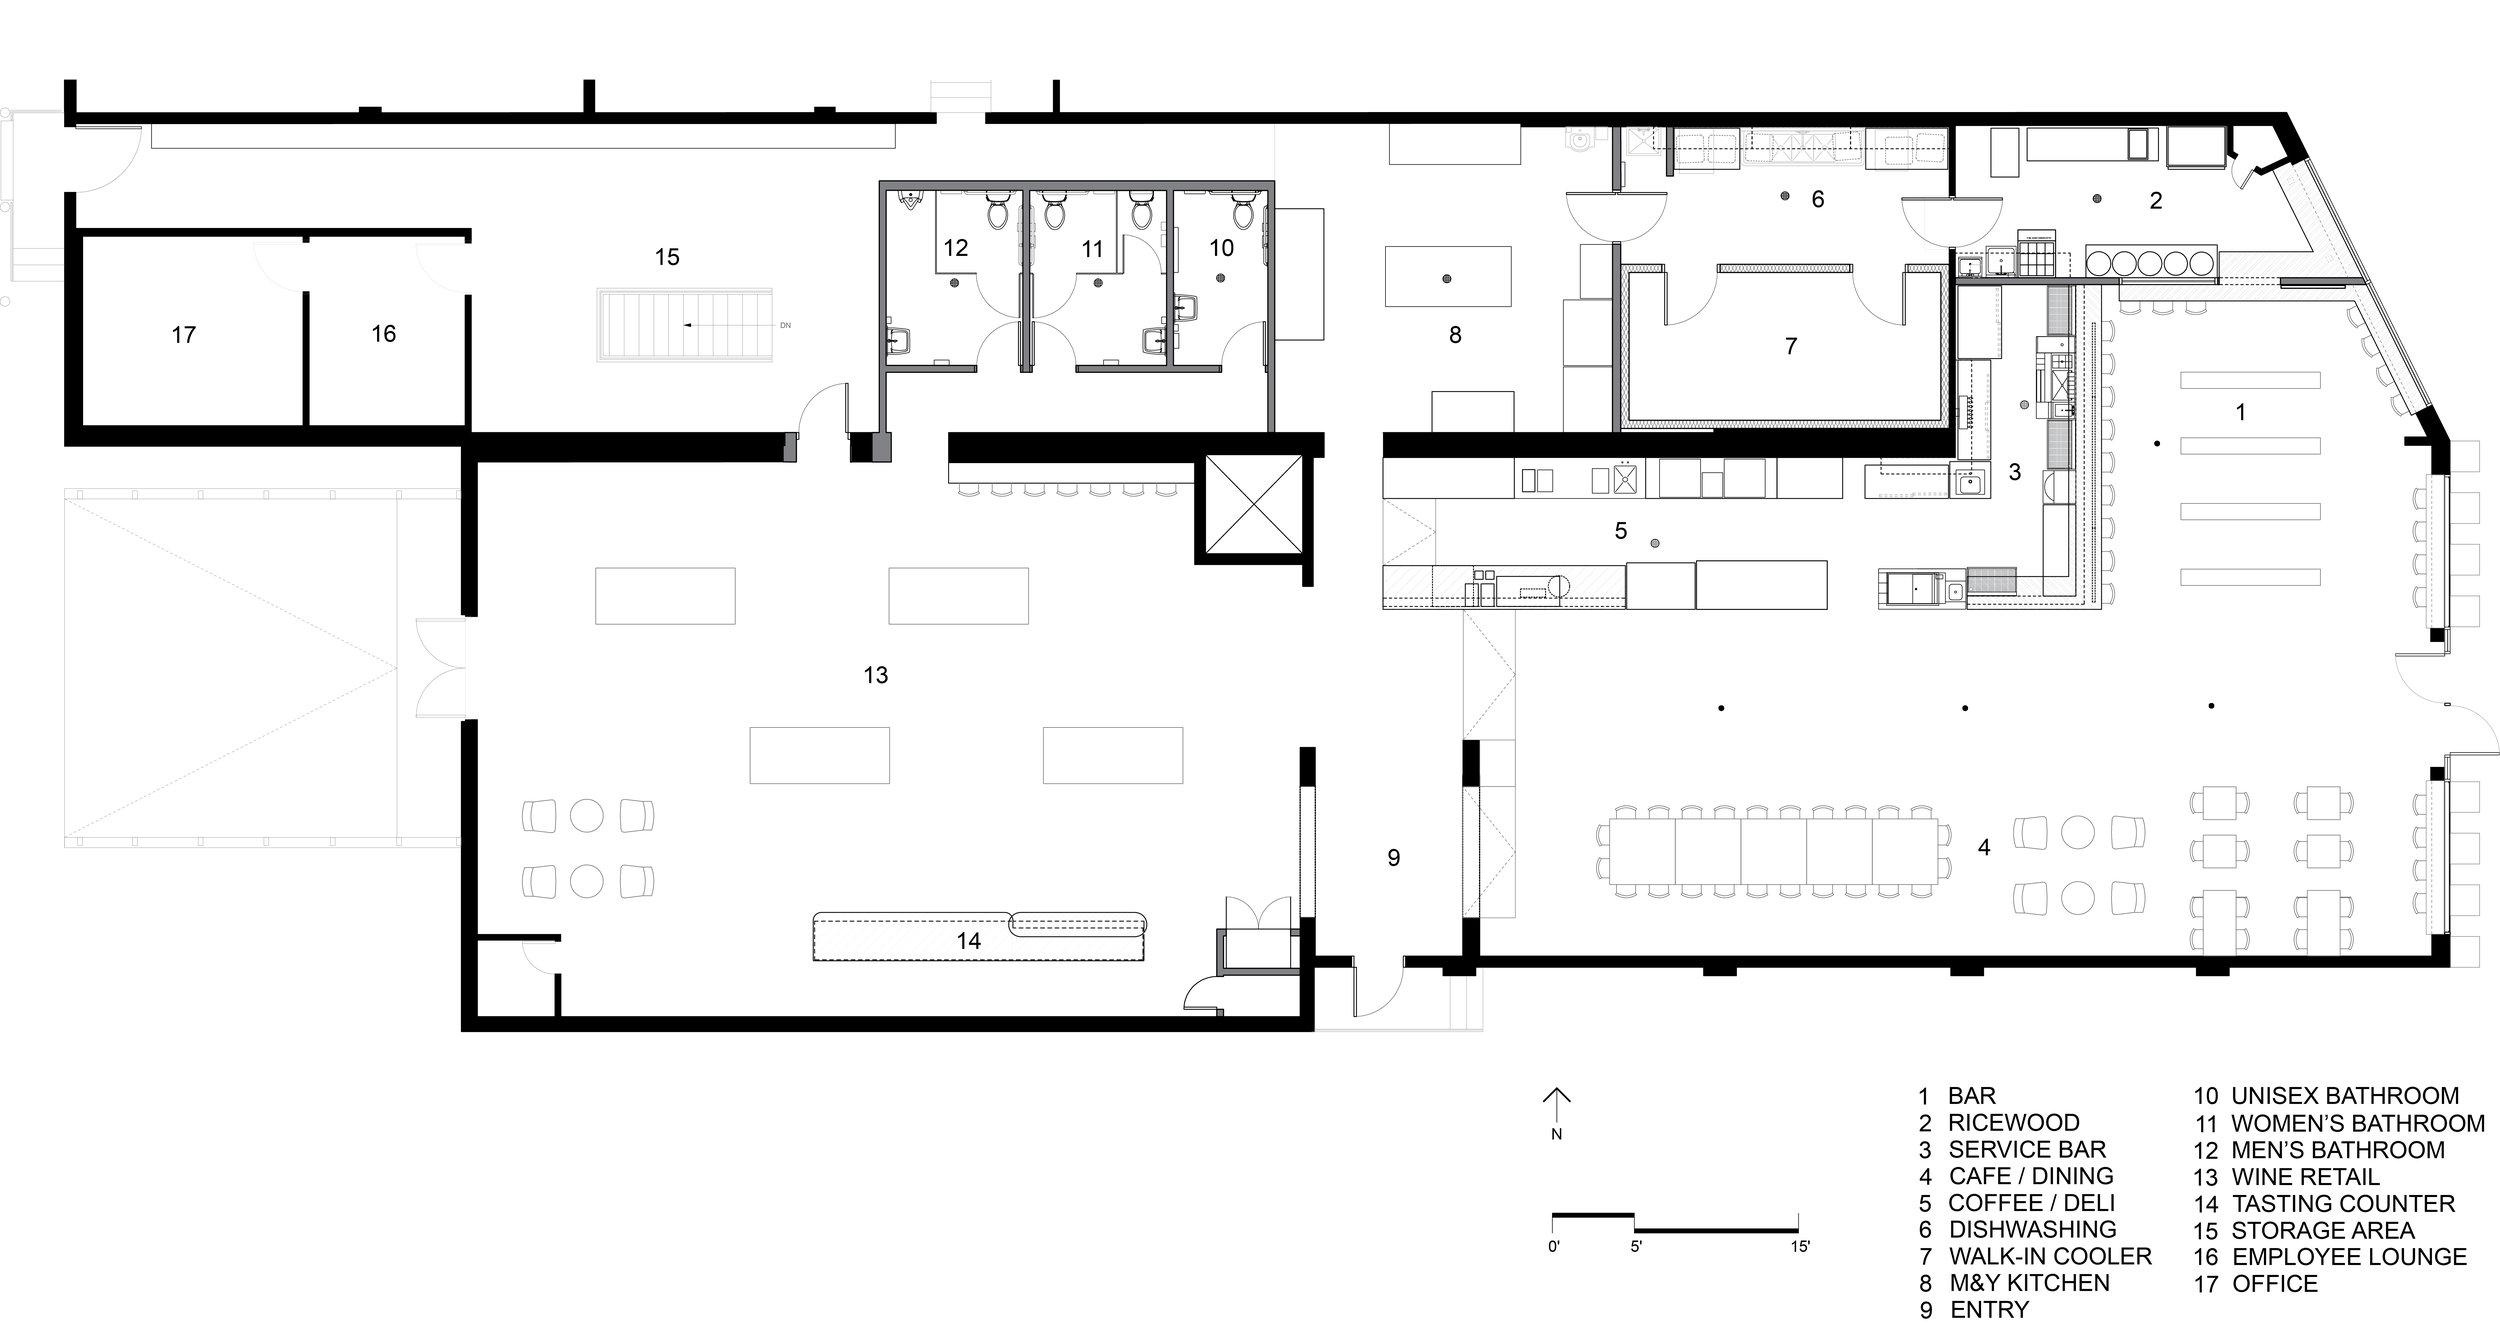 20181212_morganyork_designdrawings_plan.jpg